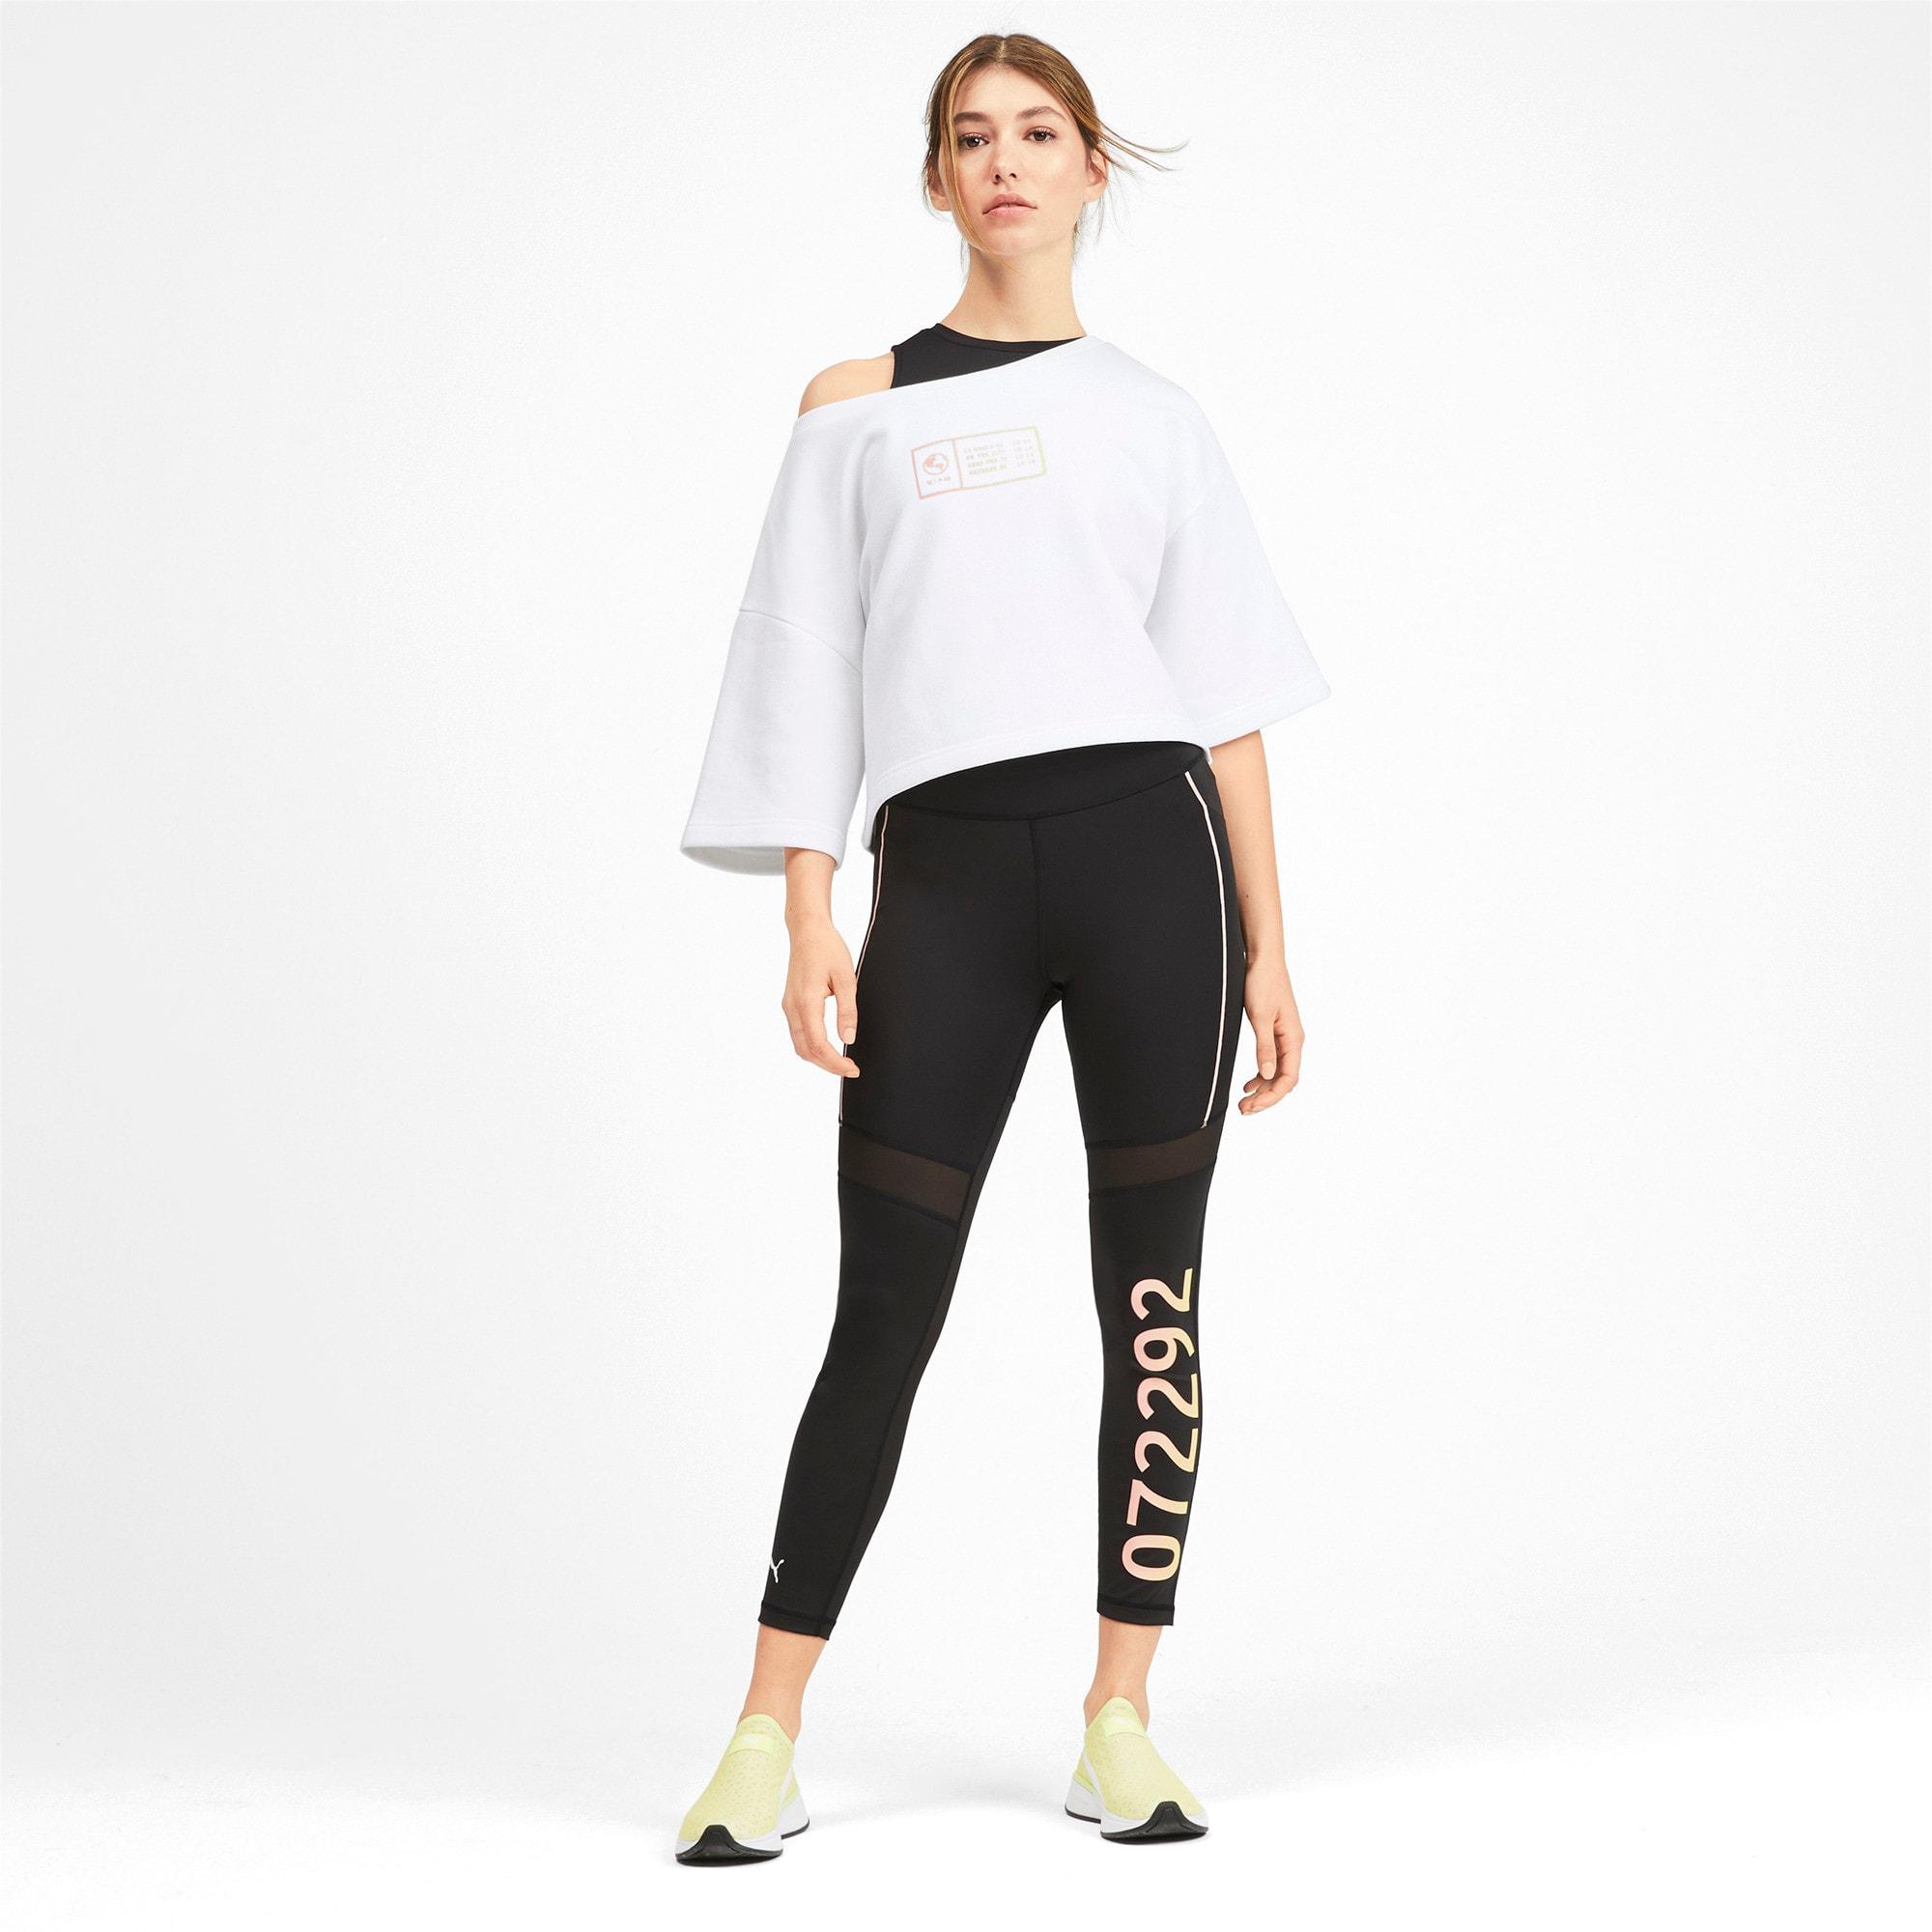 Thumbnail 3 of PUMA x SELENA GOMEZ Cropped Short Sleeve Women's Sweater, Puma White, medium